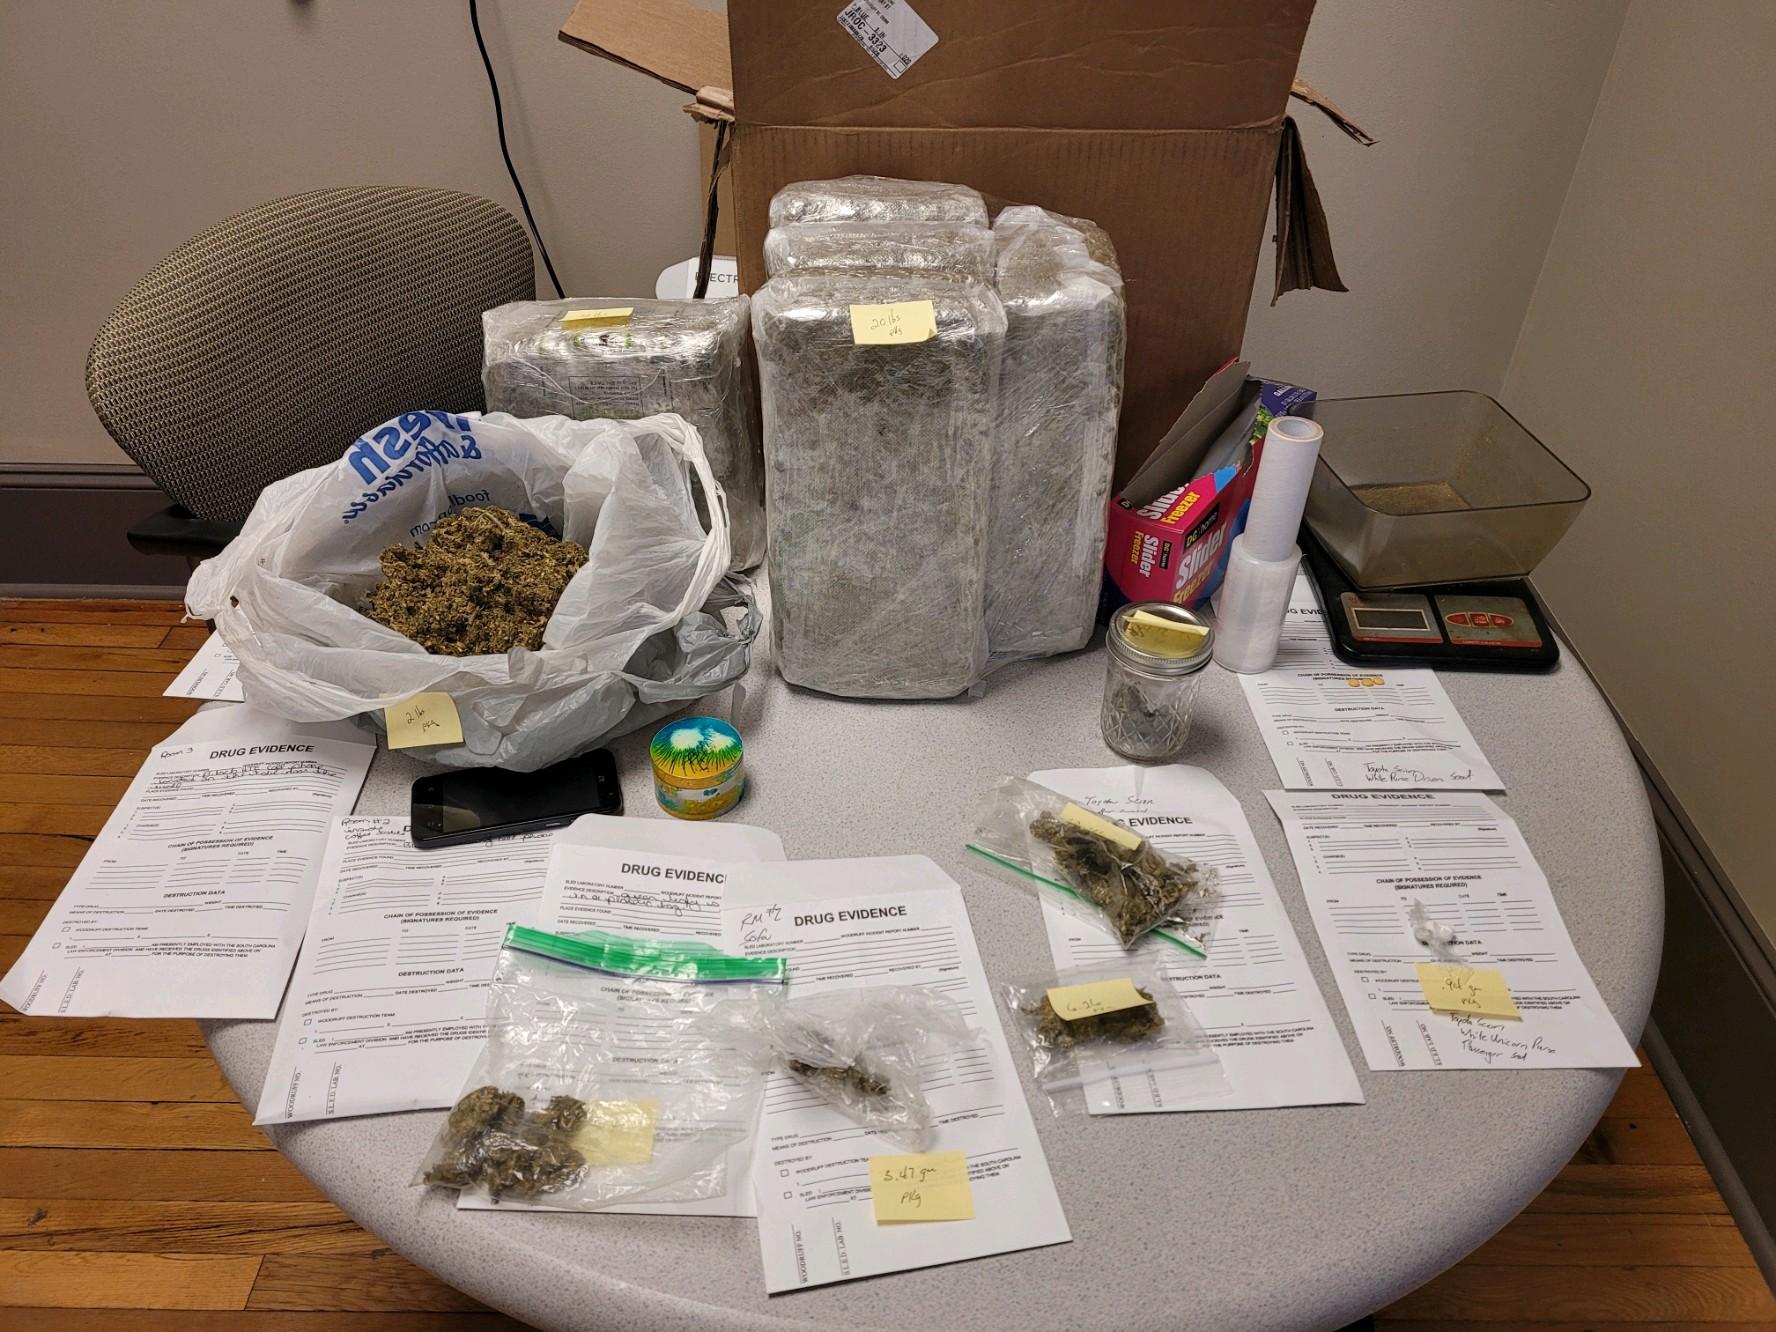 Woodruff Police Investigating After Marijuana Seized